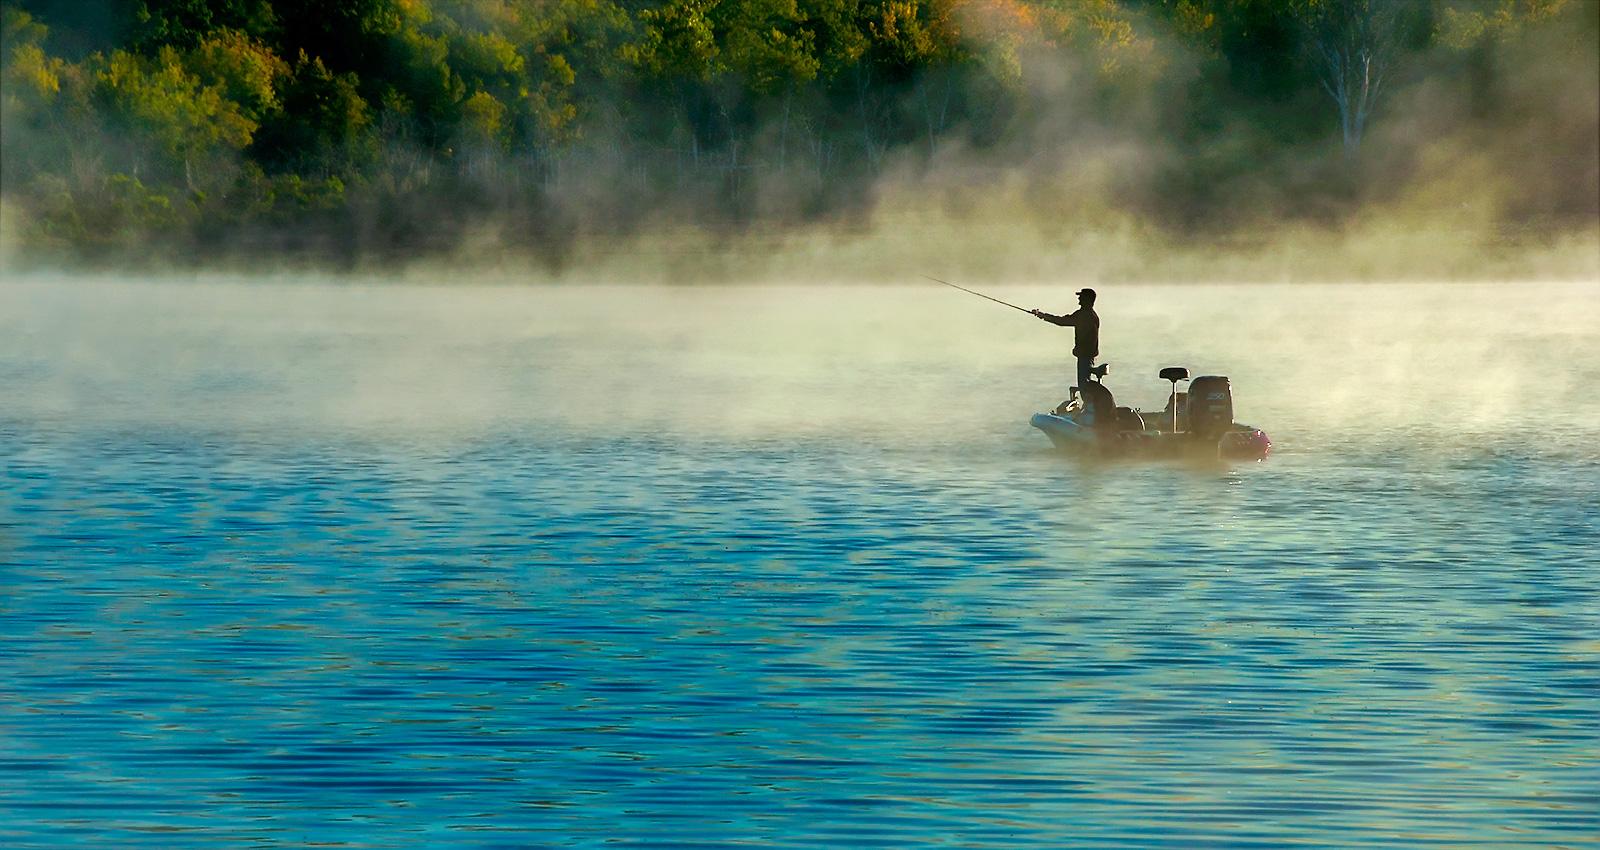 Fishing Bull Shoals Lake out of the Theodosia Marina